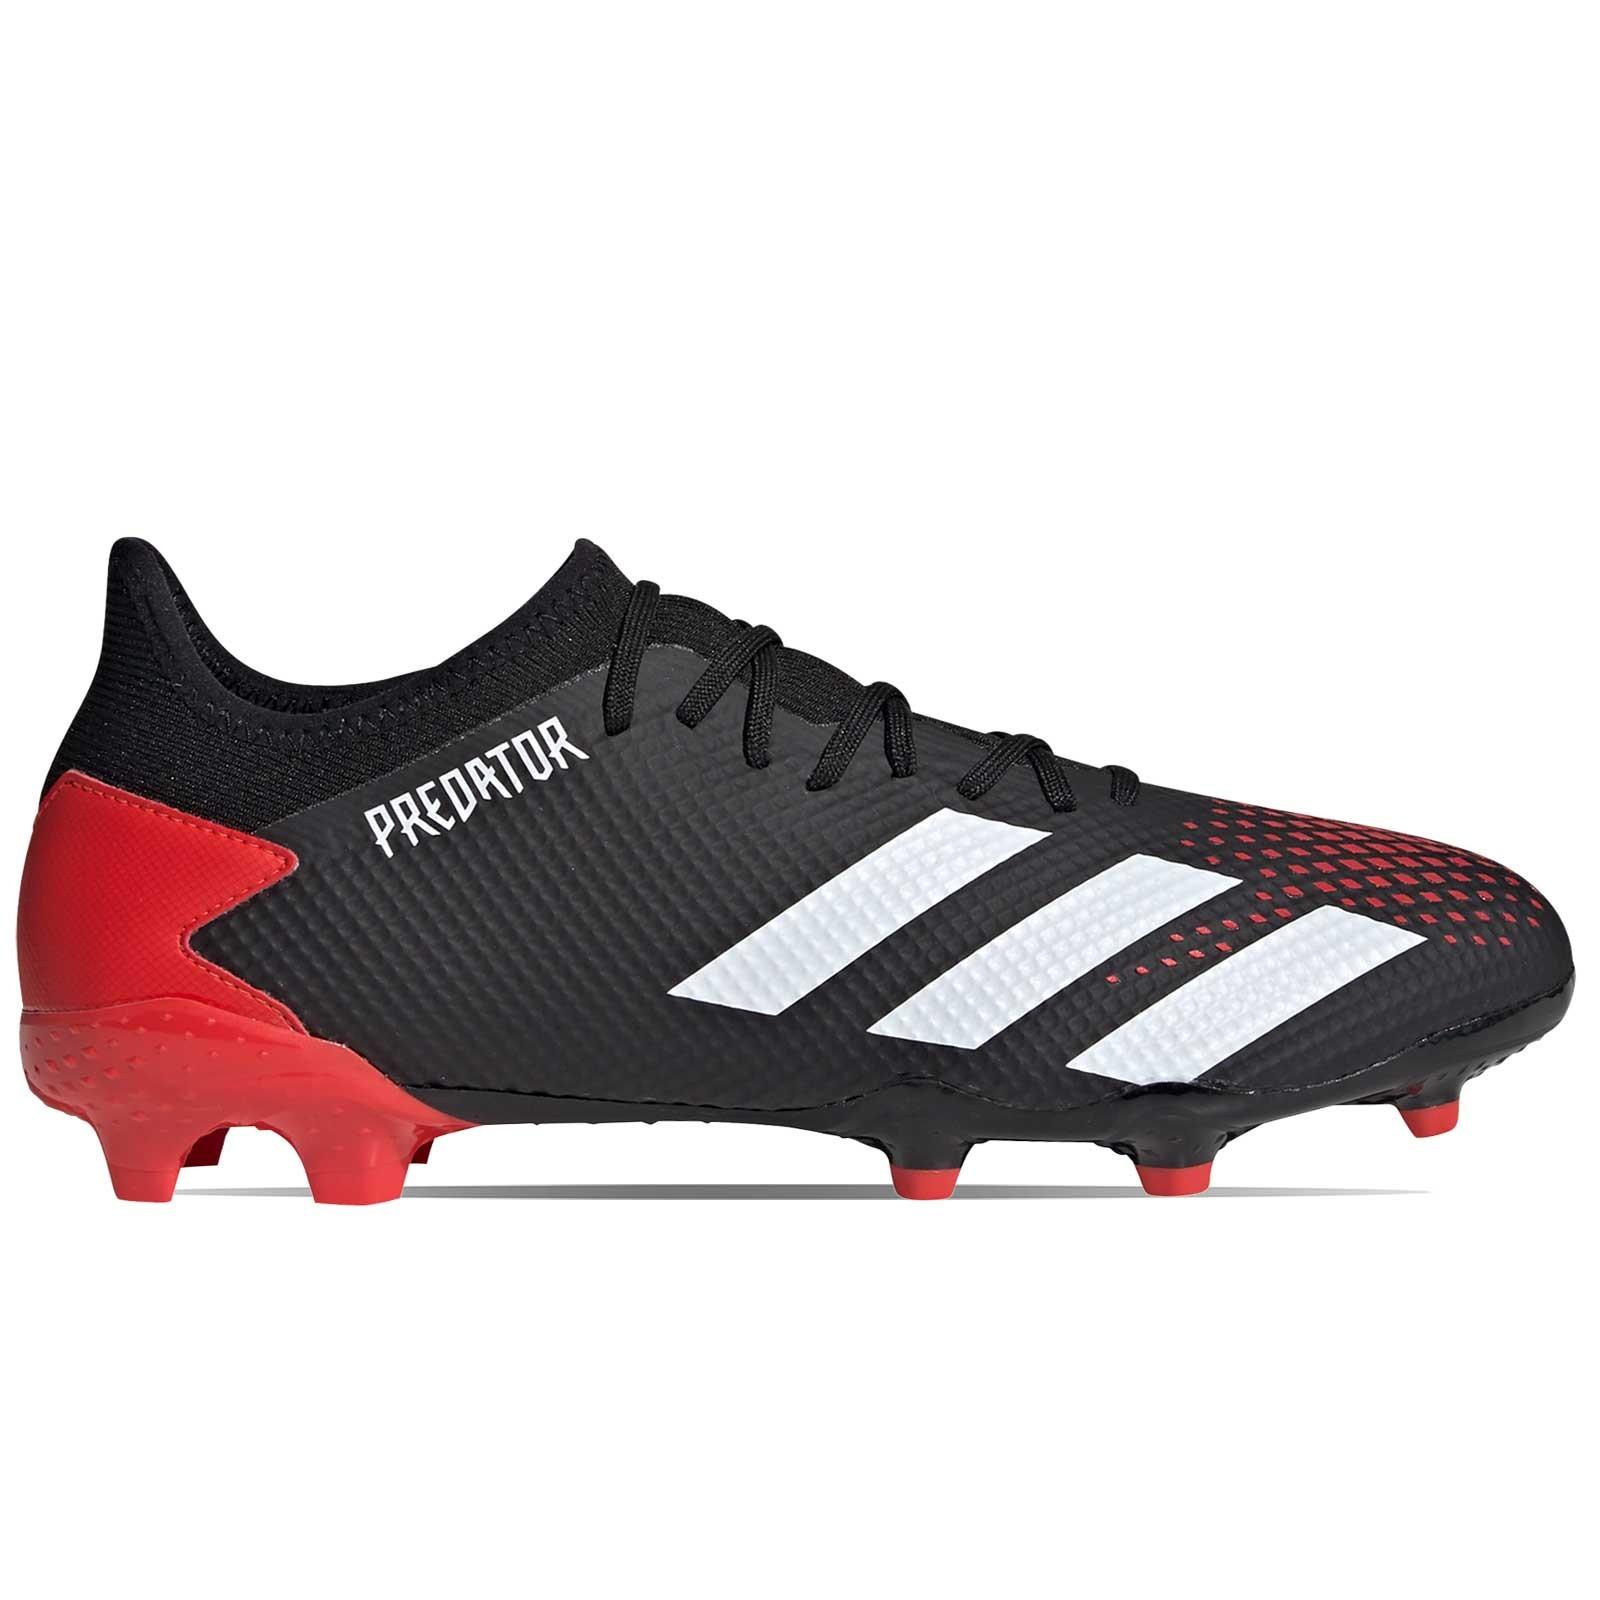 adidas Buty Piłkarskie adidas Predator LZ XTRX SG Miękka